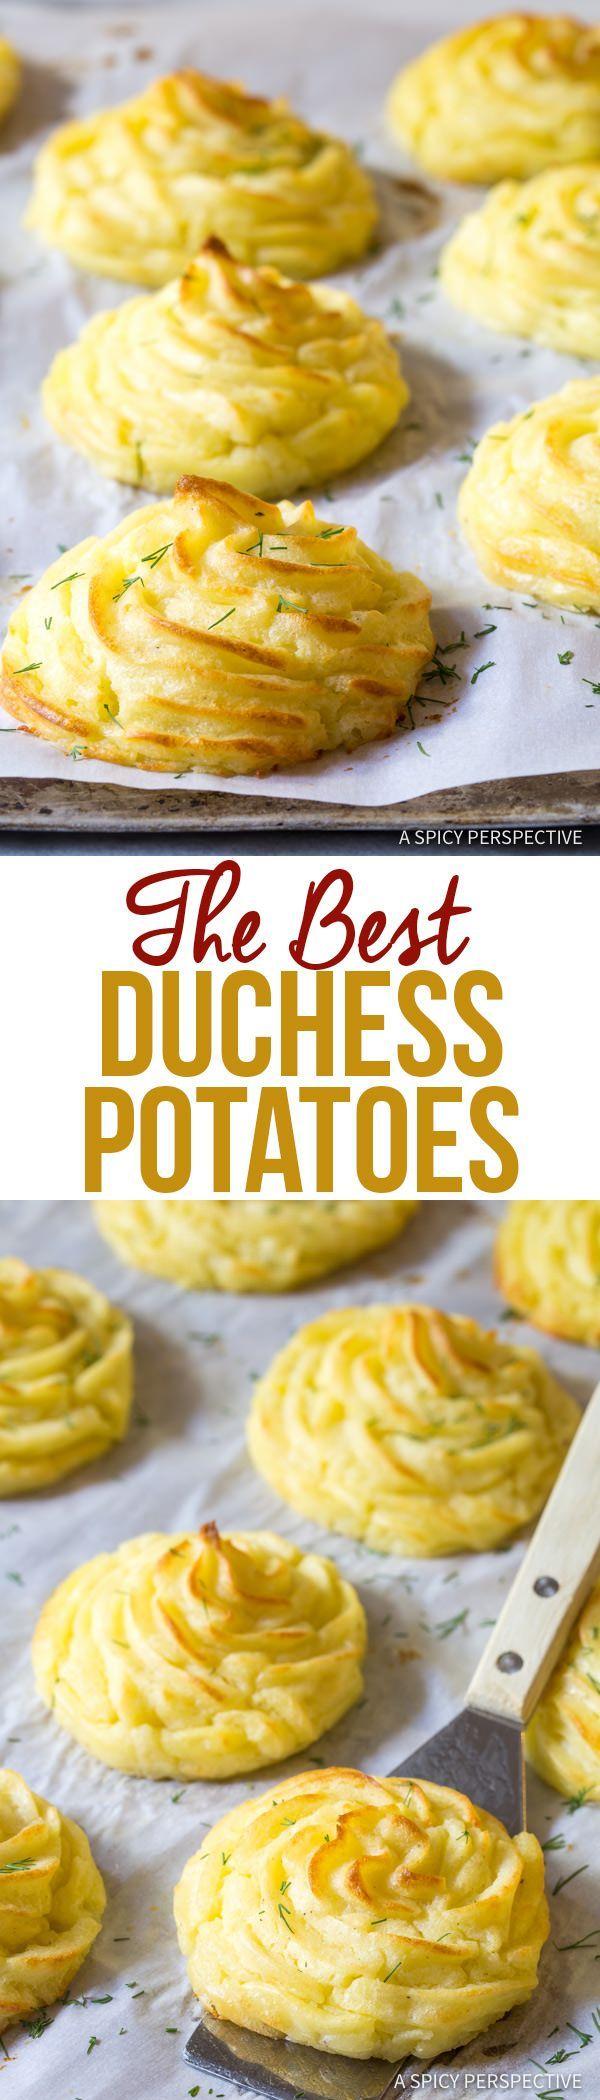 Best Ever Duchess Potatoes Recipe | http://ASpicyPerspective.com